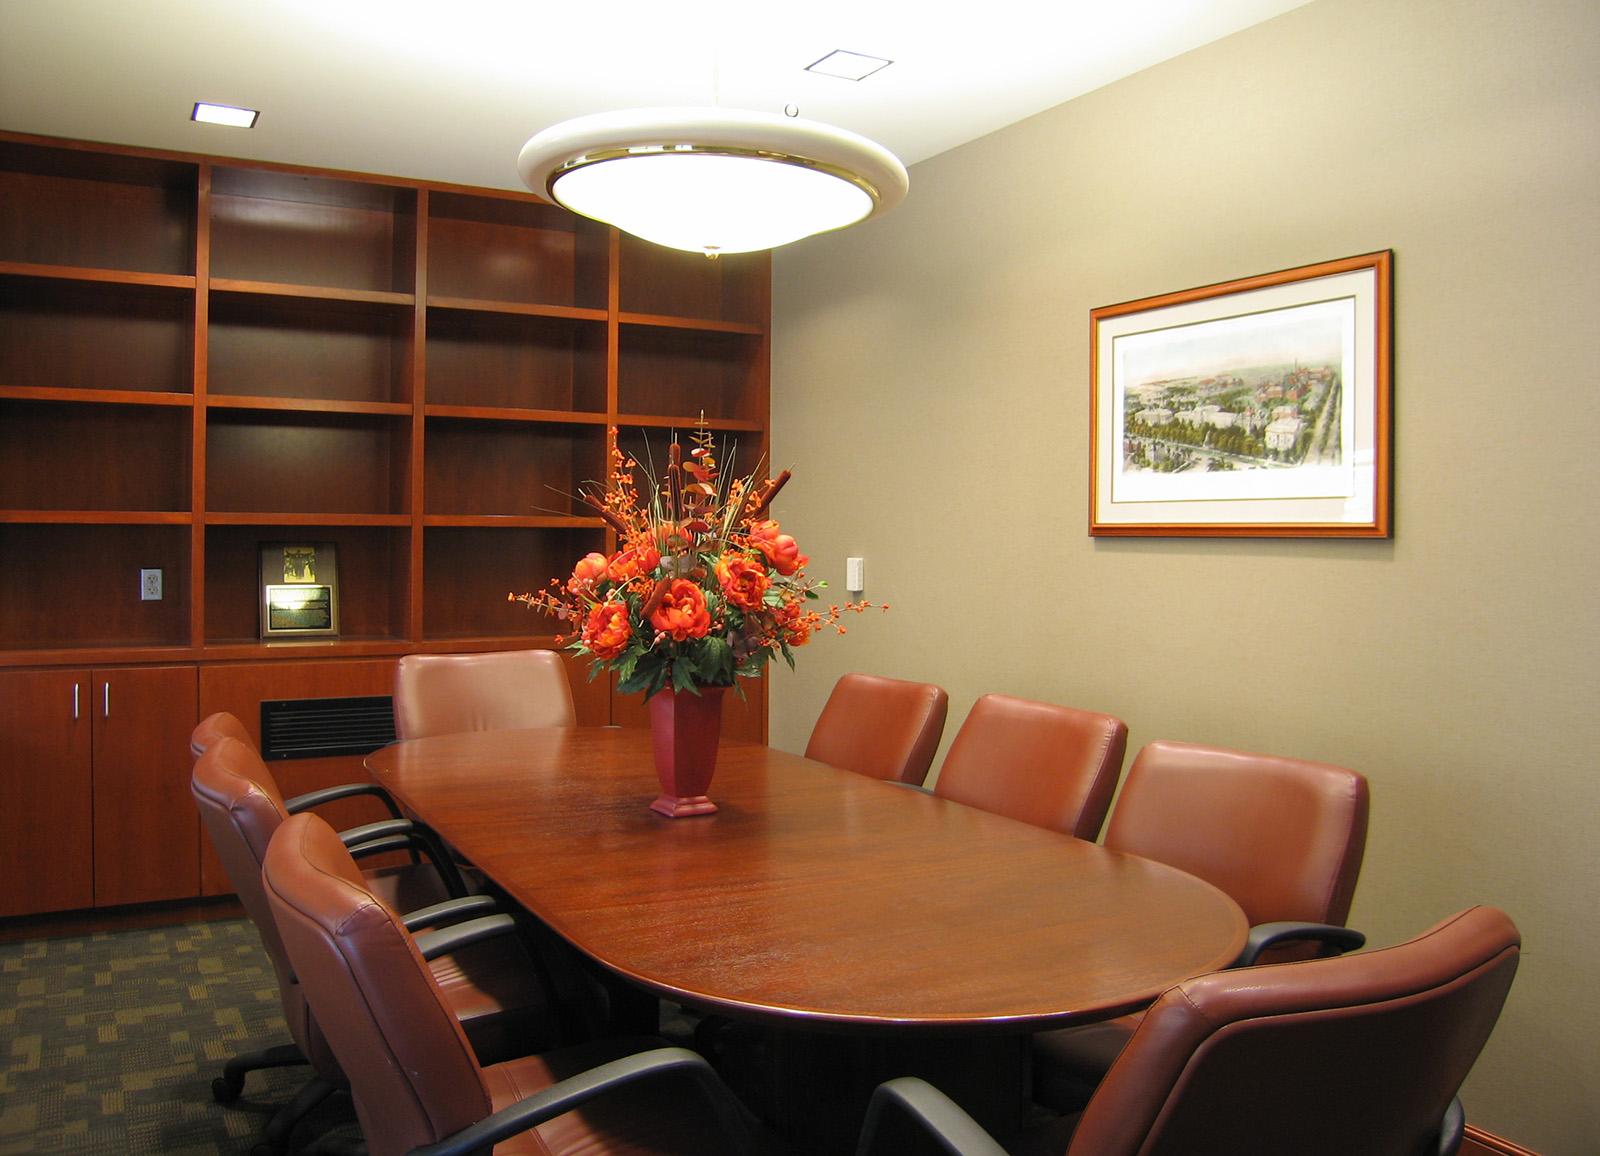 university-of-michigan-evans-scholars-conference-room